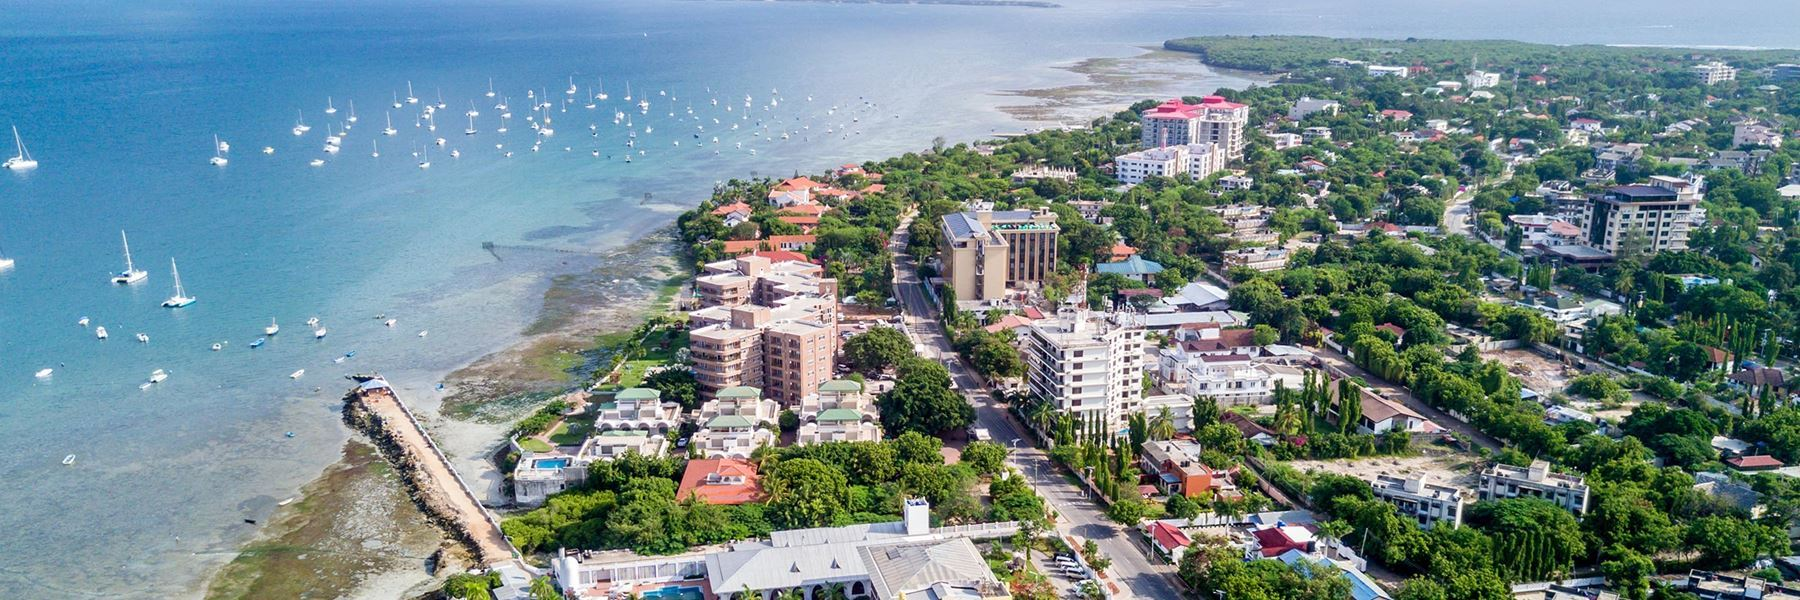 Dar-es-Salaam City, Tz